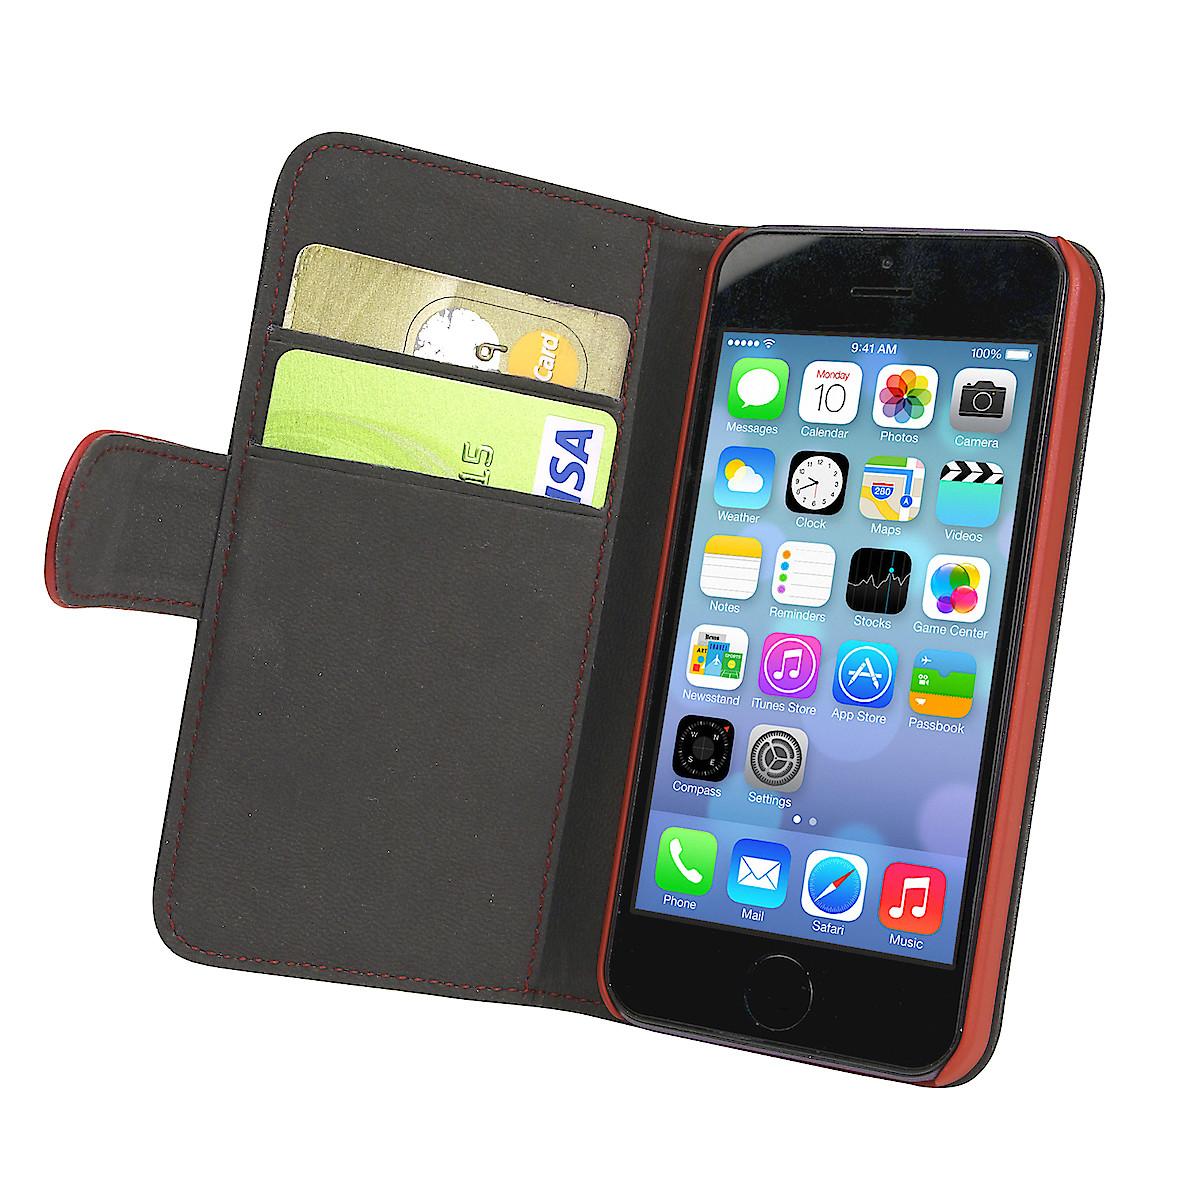 Lompakkokotelo iPhone 5:lle/5S:lle/SE:lle, Holdit